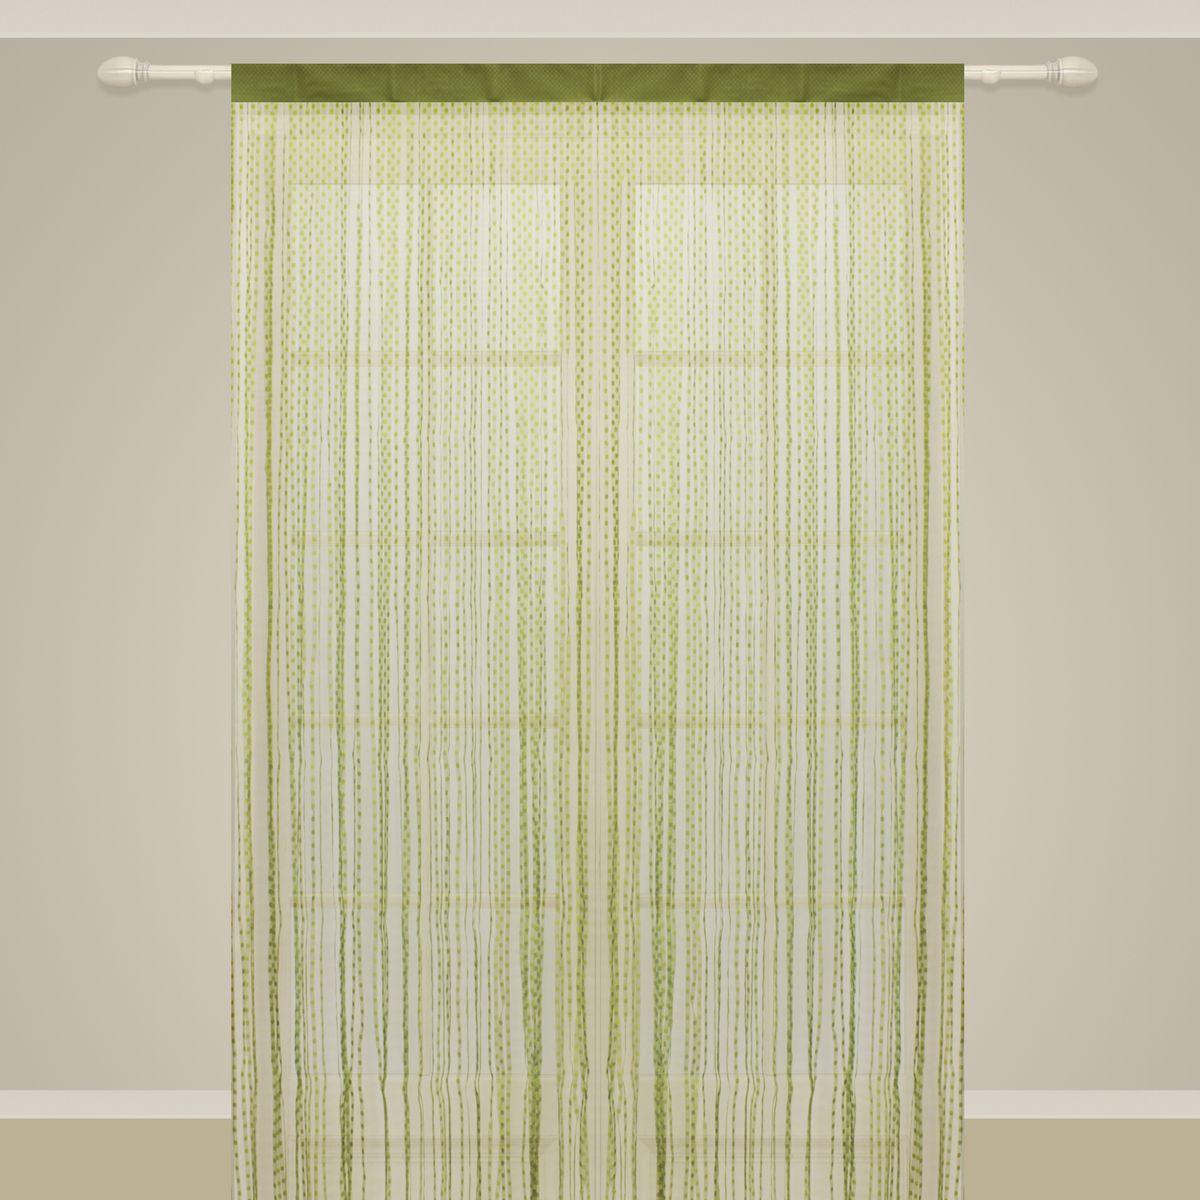 Штора нитяная Sanpa Home Collection, на ленте, цвет: салатовый, высота 290 см. SP102SP 102/LIMEGREEN, , 150*290 см